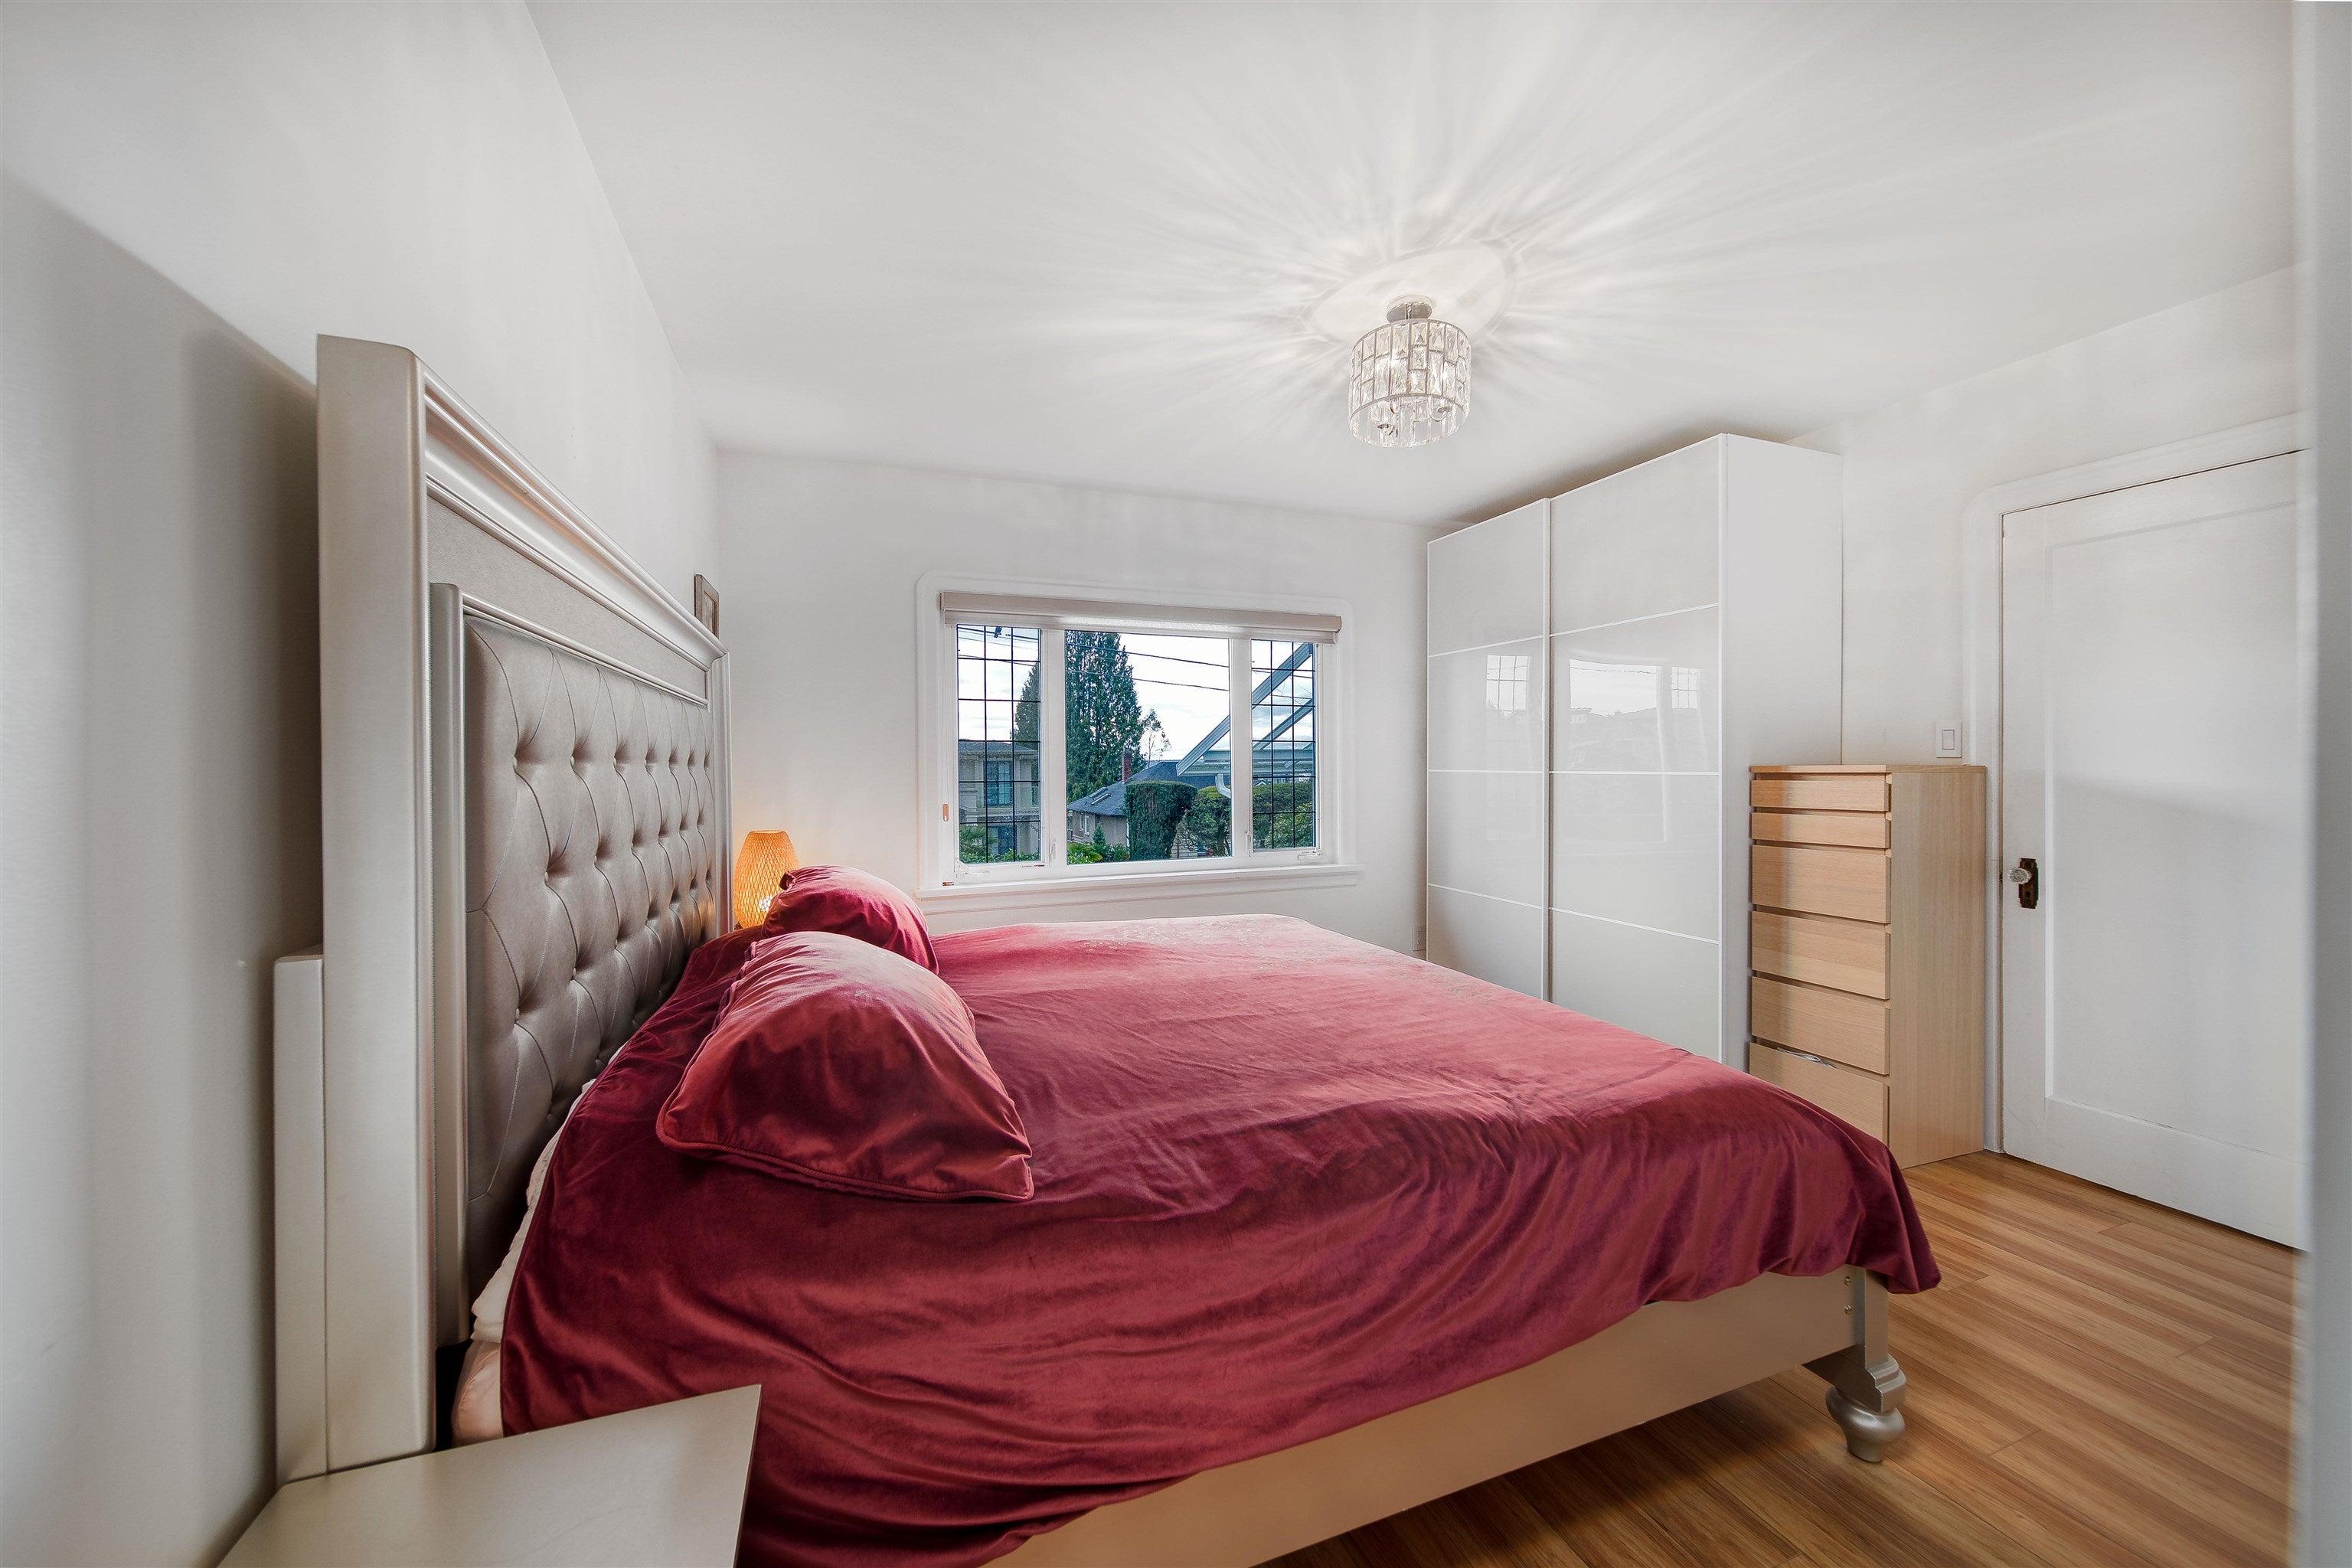 1357 FULTON AVENUE - Ambleside House/Single Family for sale, 6 Bedrooms (R2617731) - #19